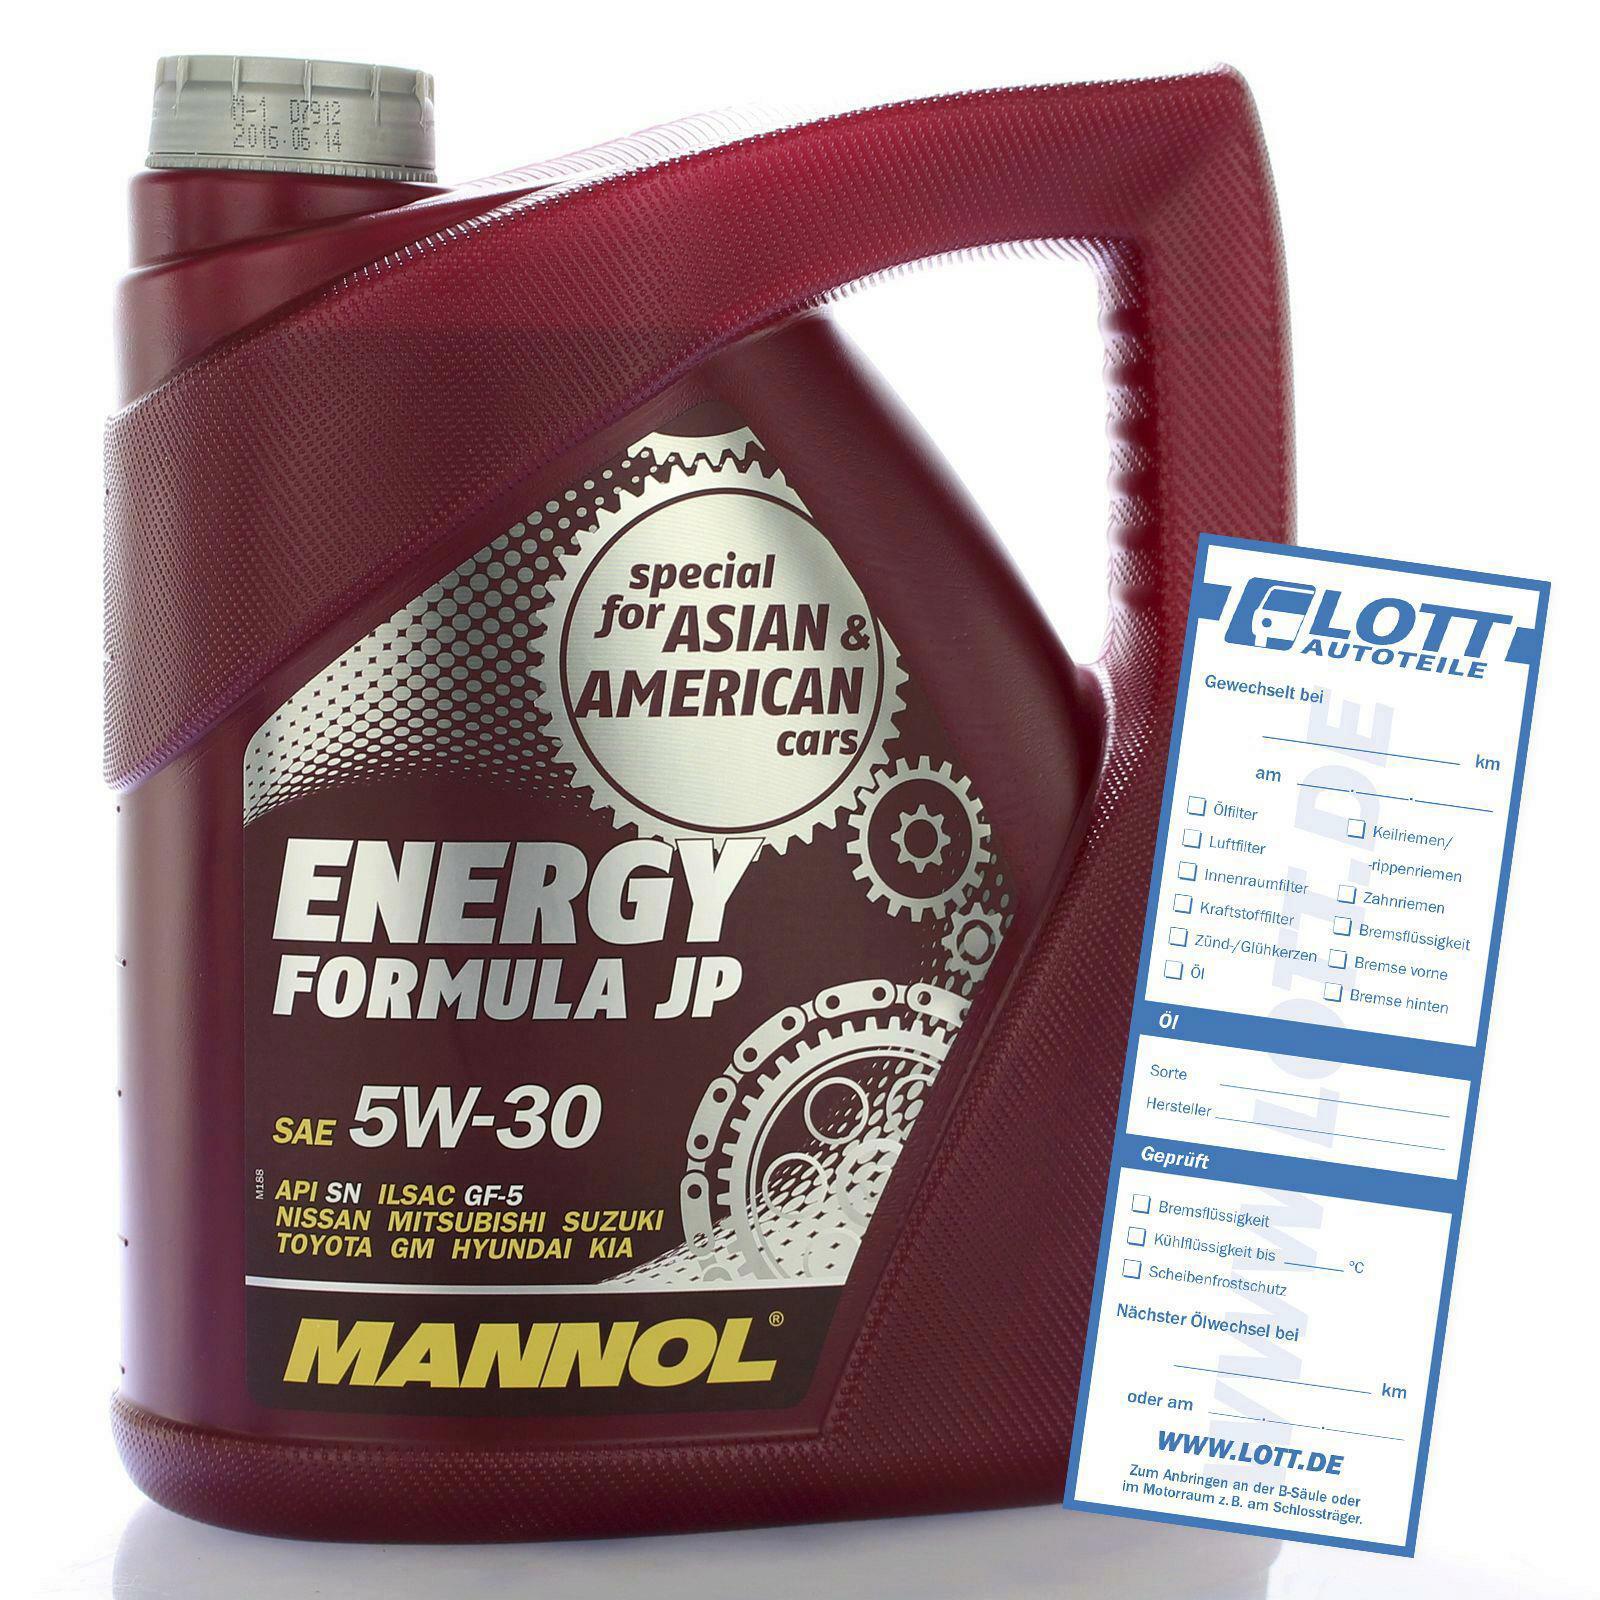 Mannol Energy Formular JP 4 Liter